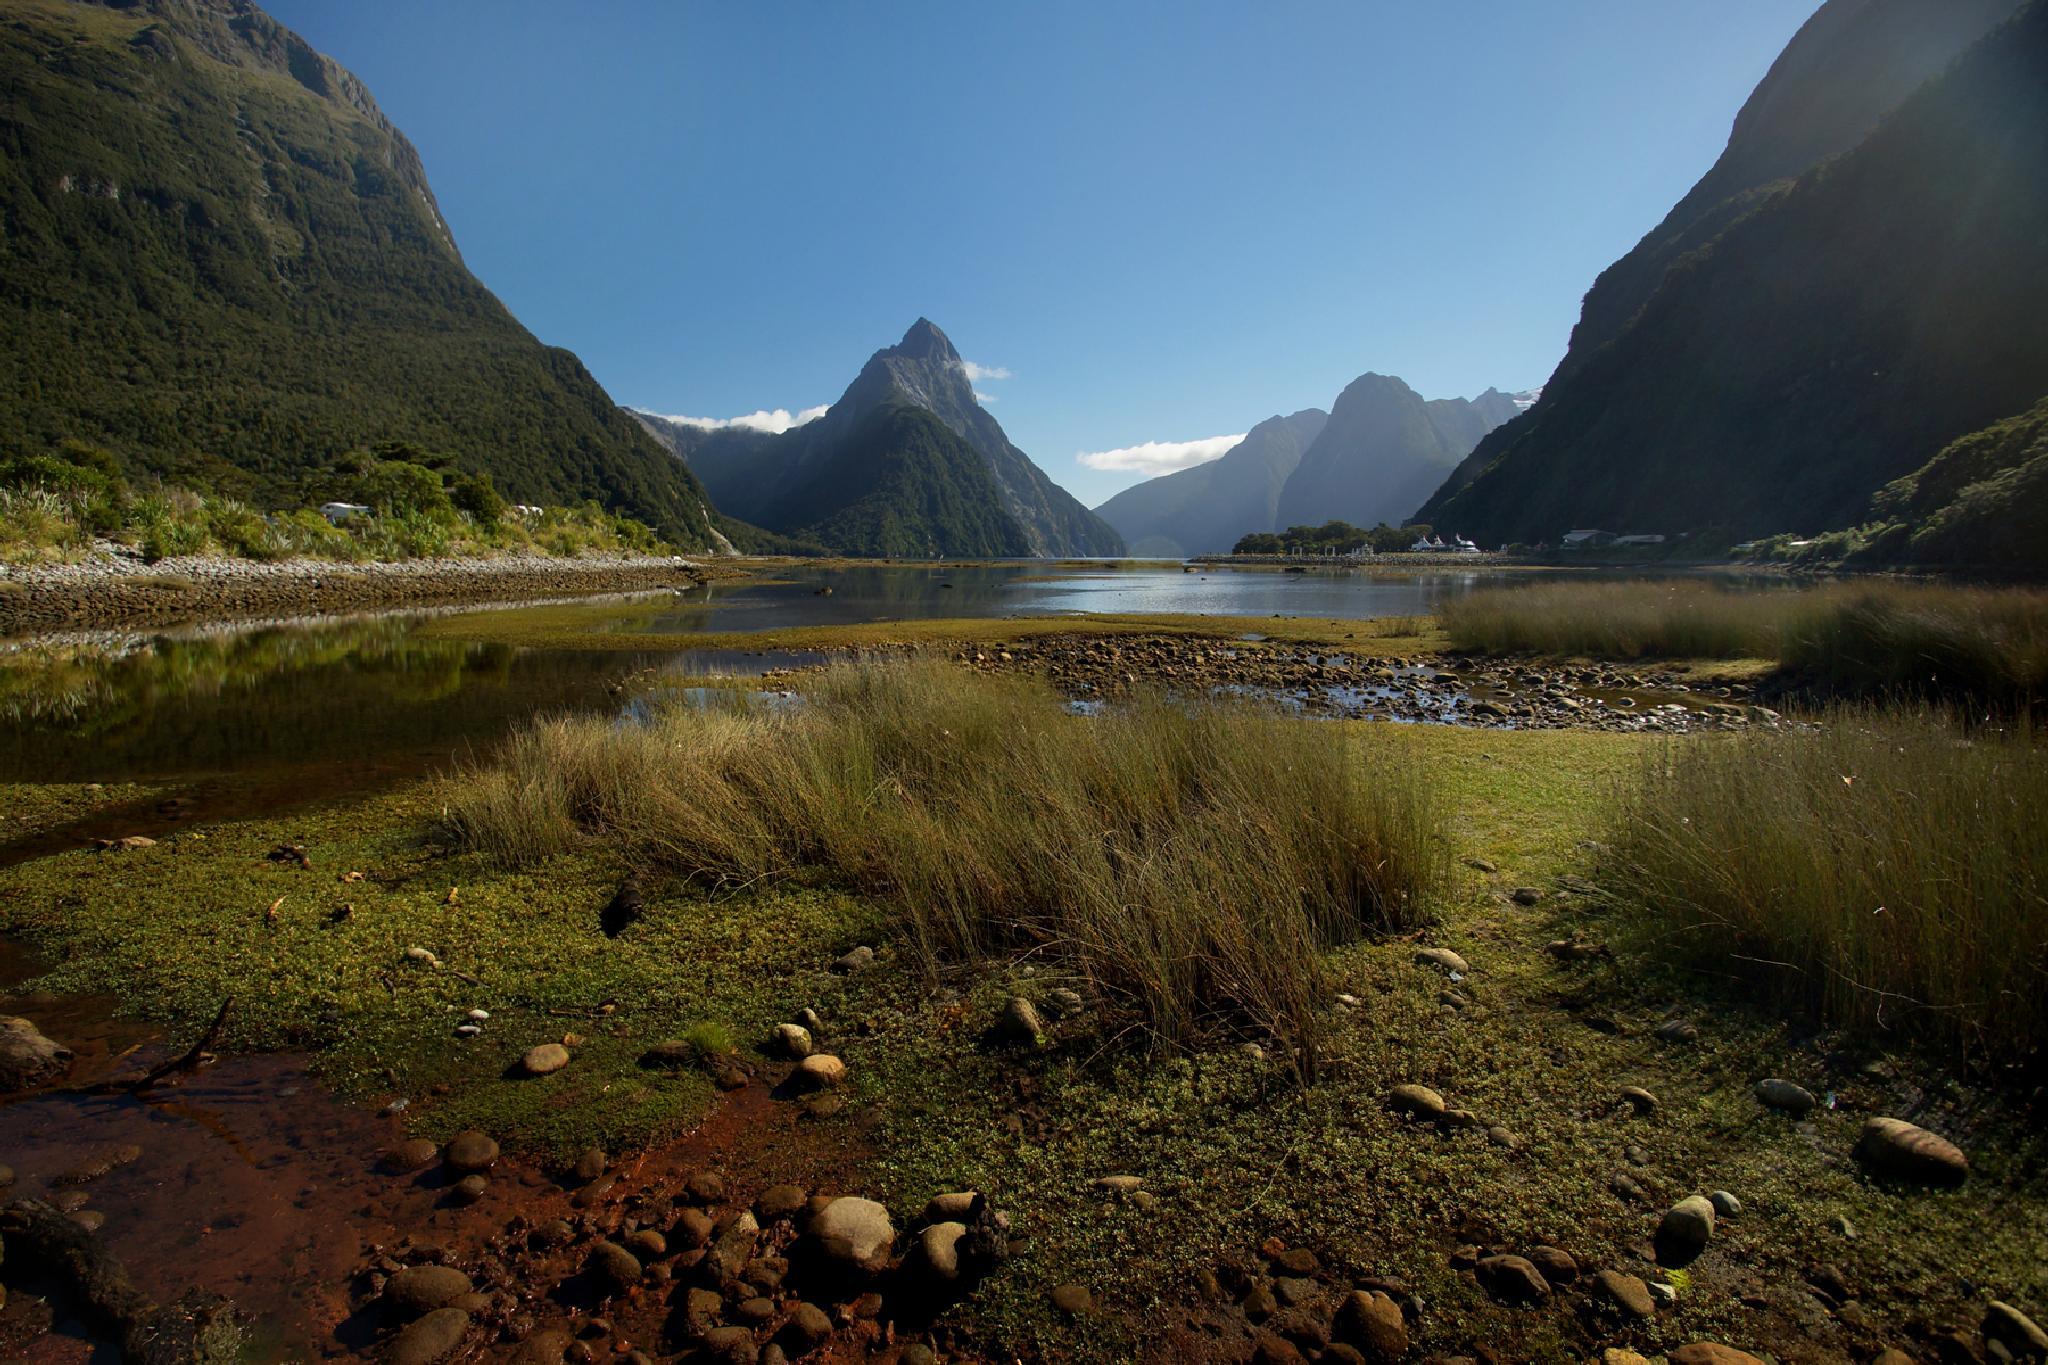 Milford Sound by DraganKeca